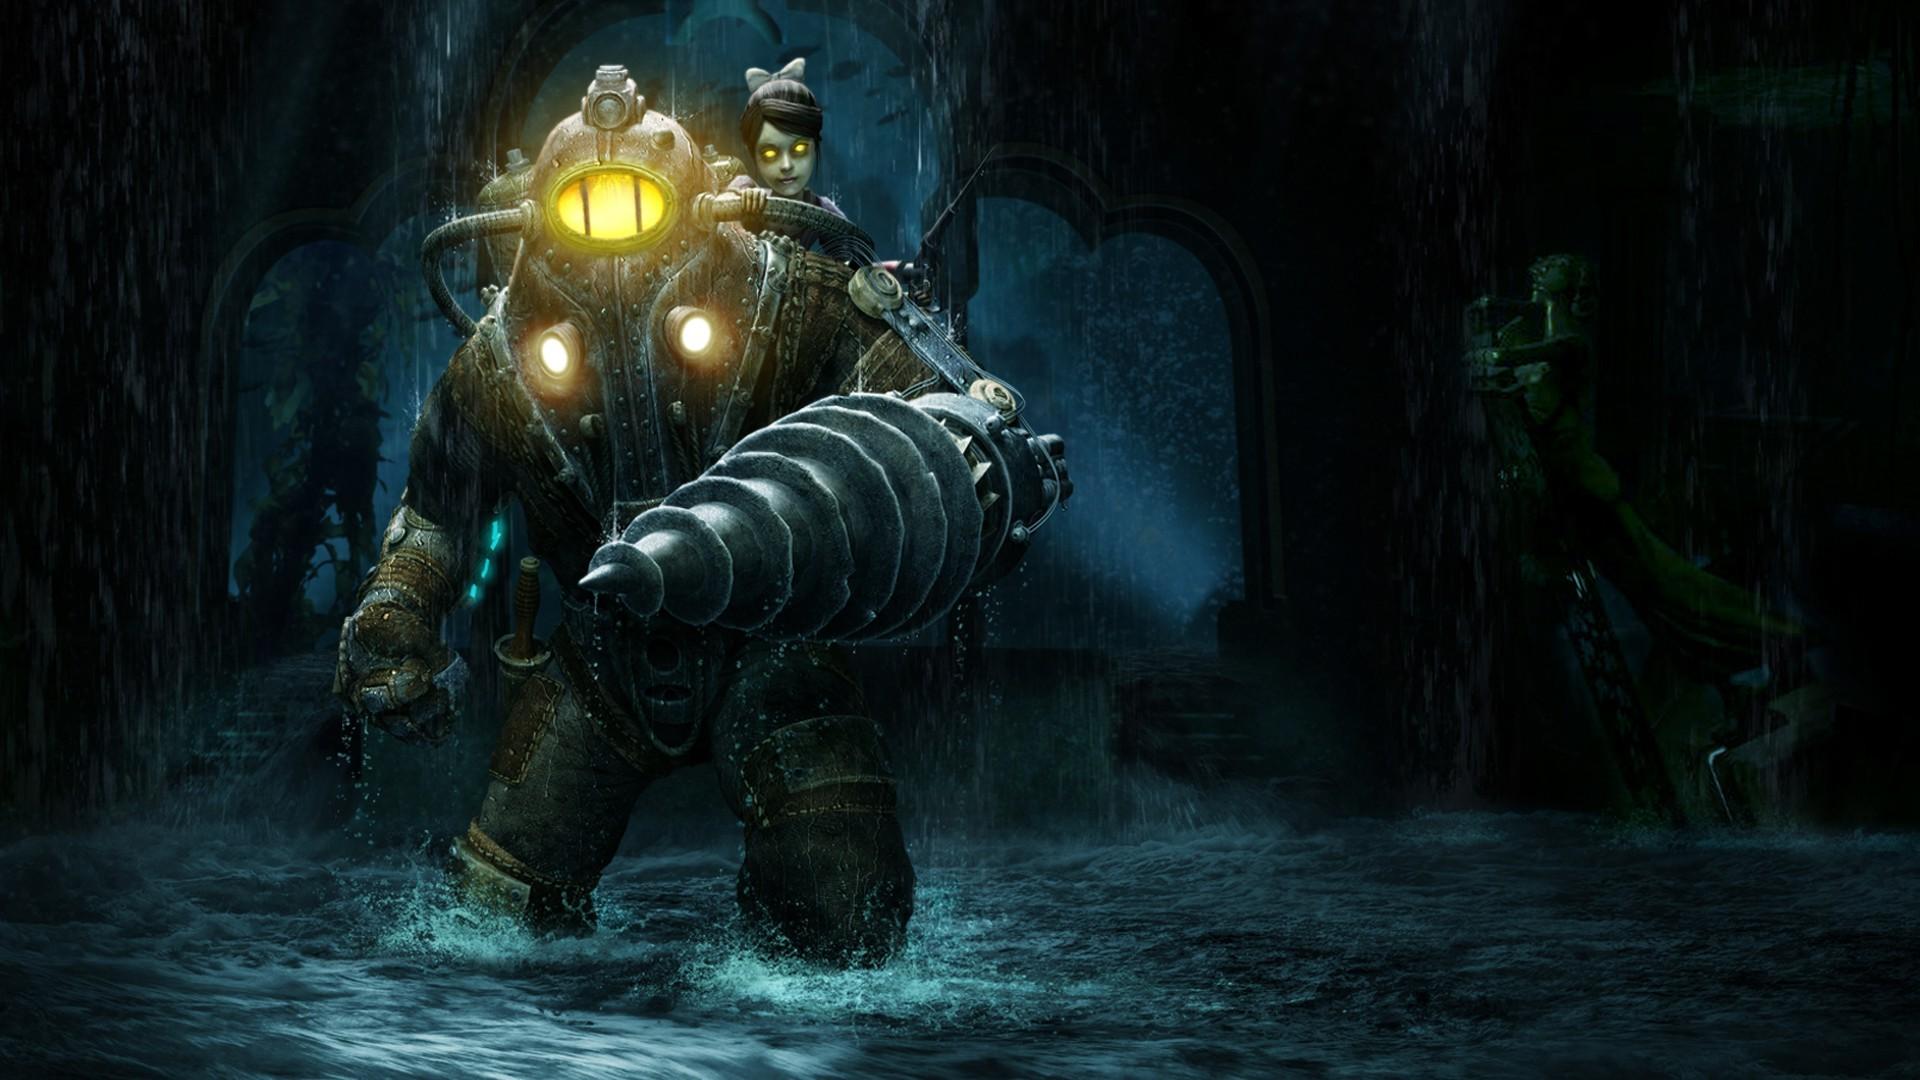 Wallpaper Big Daddy Bioshock Mythology Midnight Ghost Ship